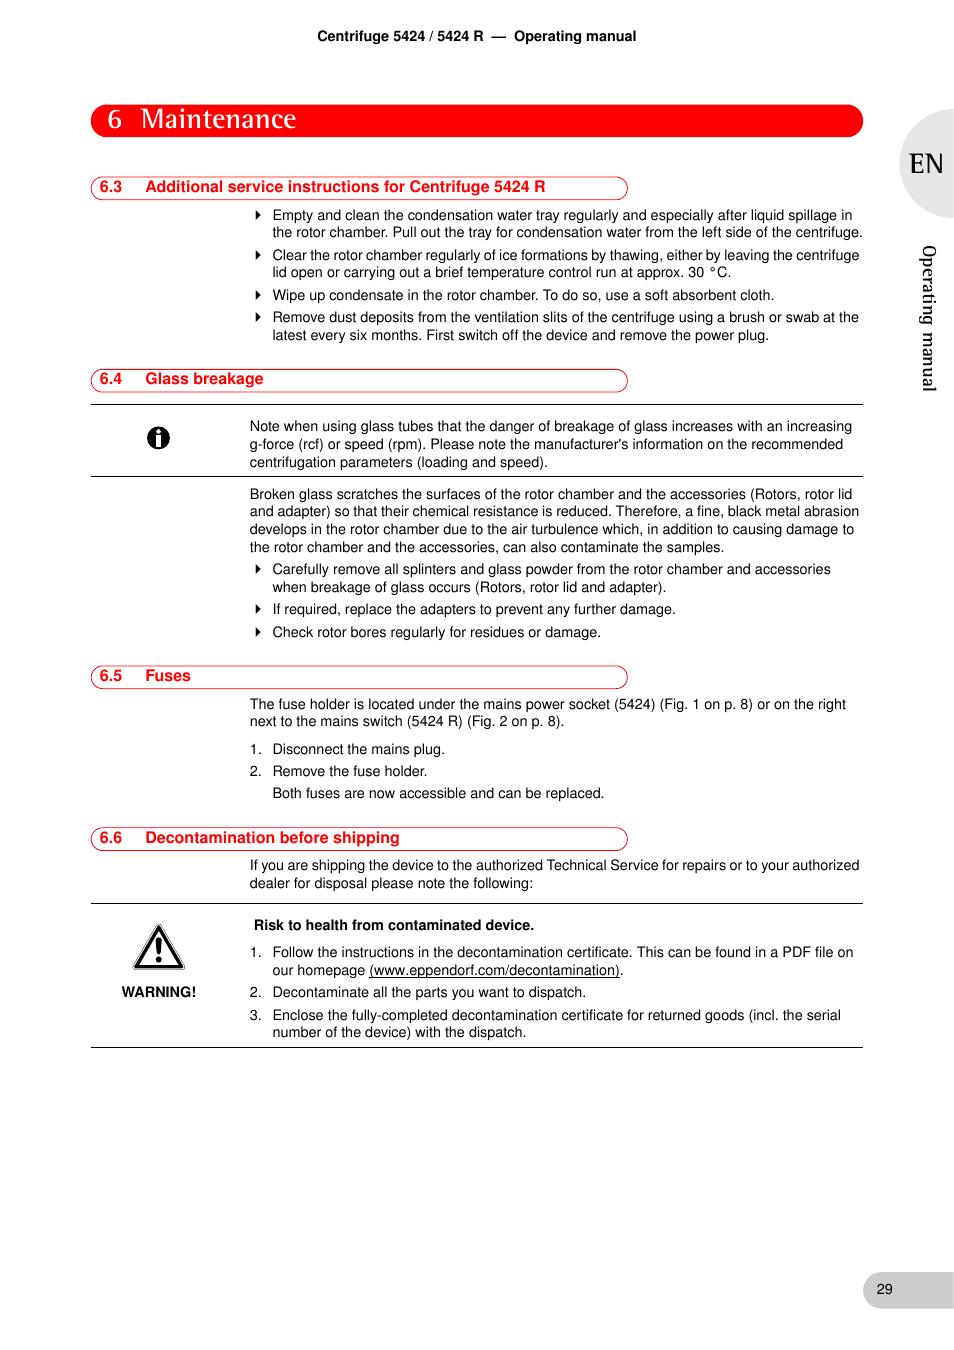 eppendorf centrifuge 5424 service manual